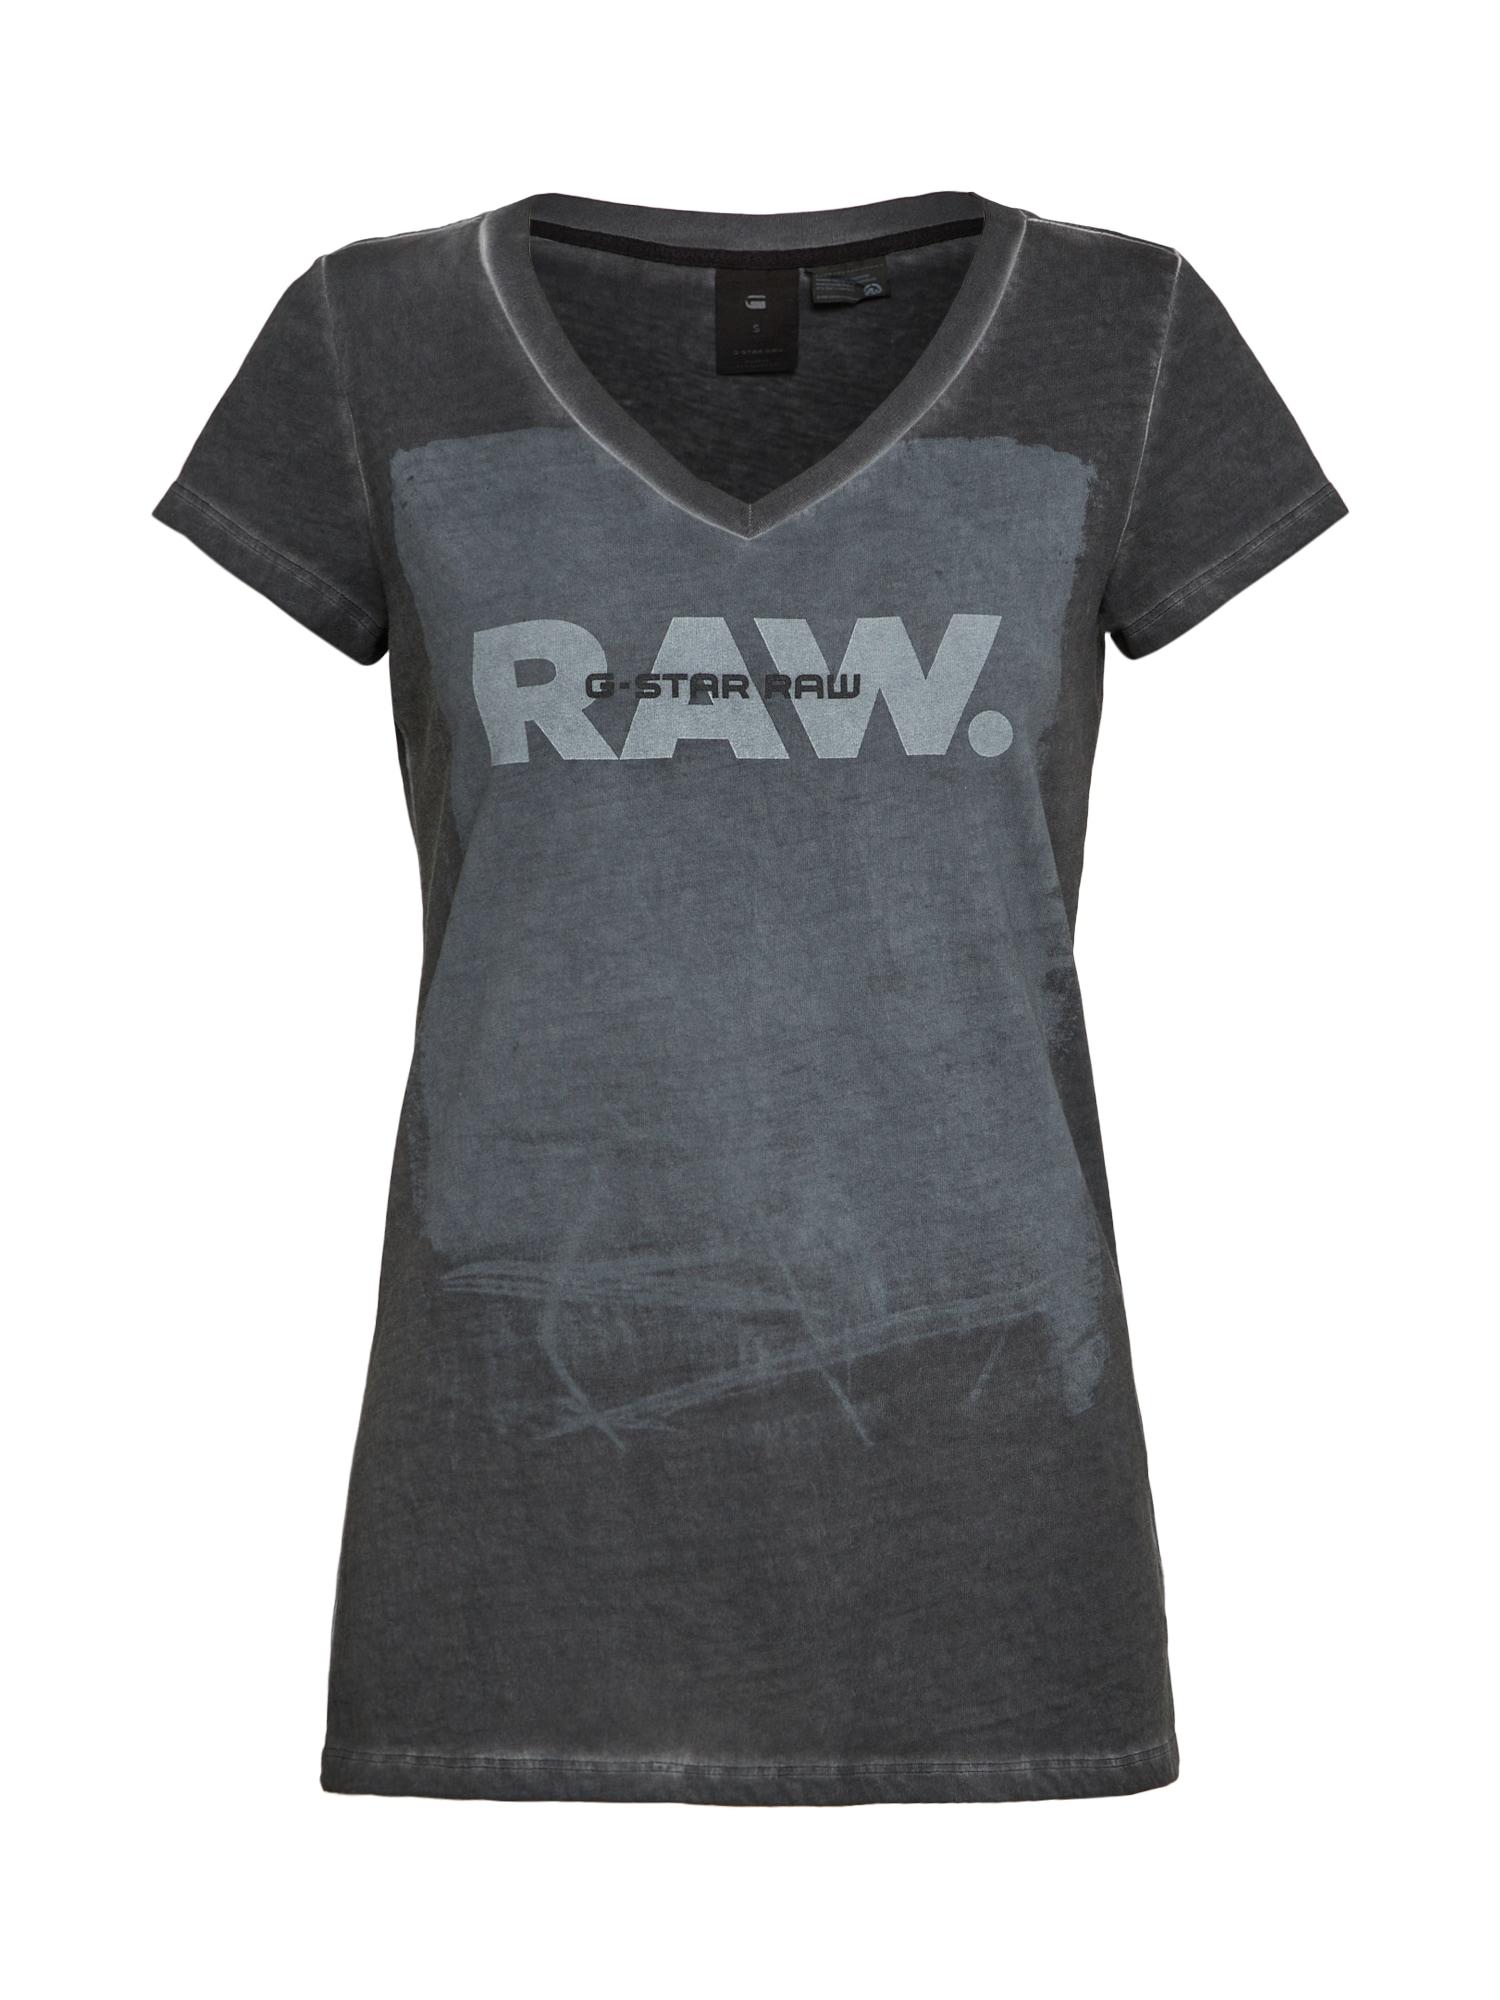 G-STAR RAW Dames Shirt grijs antraciet